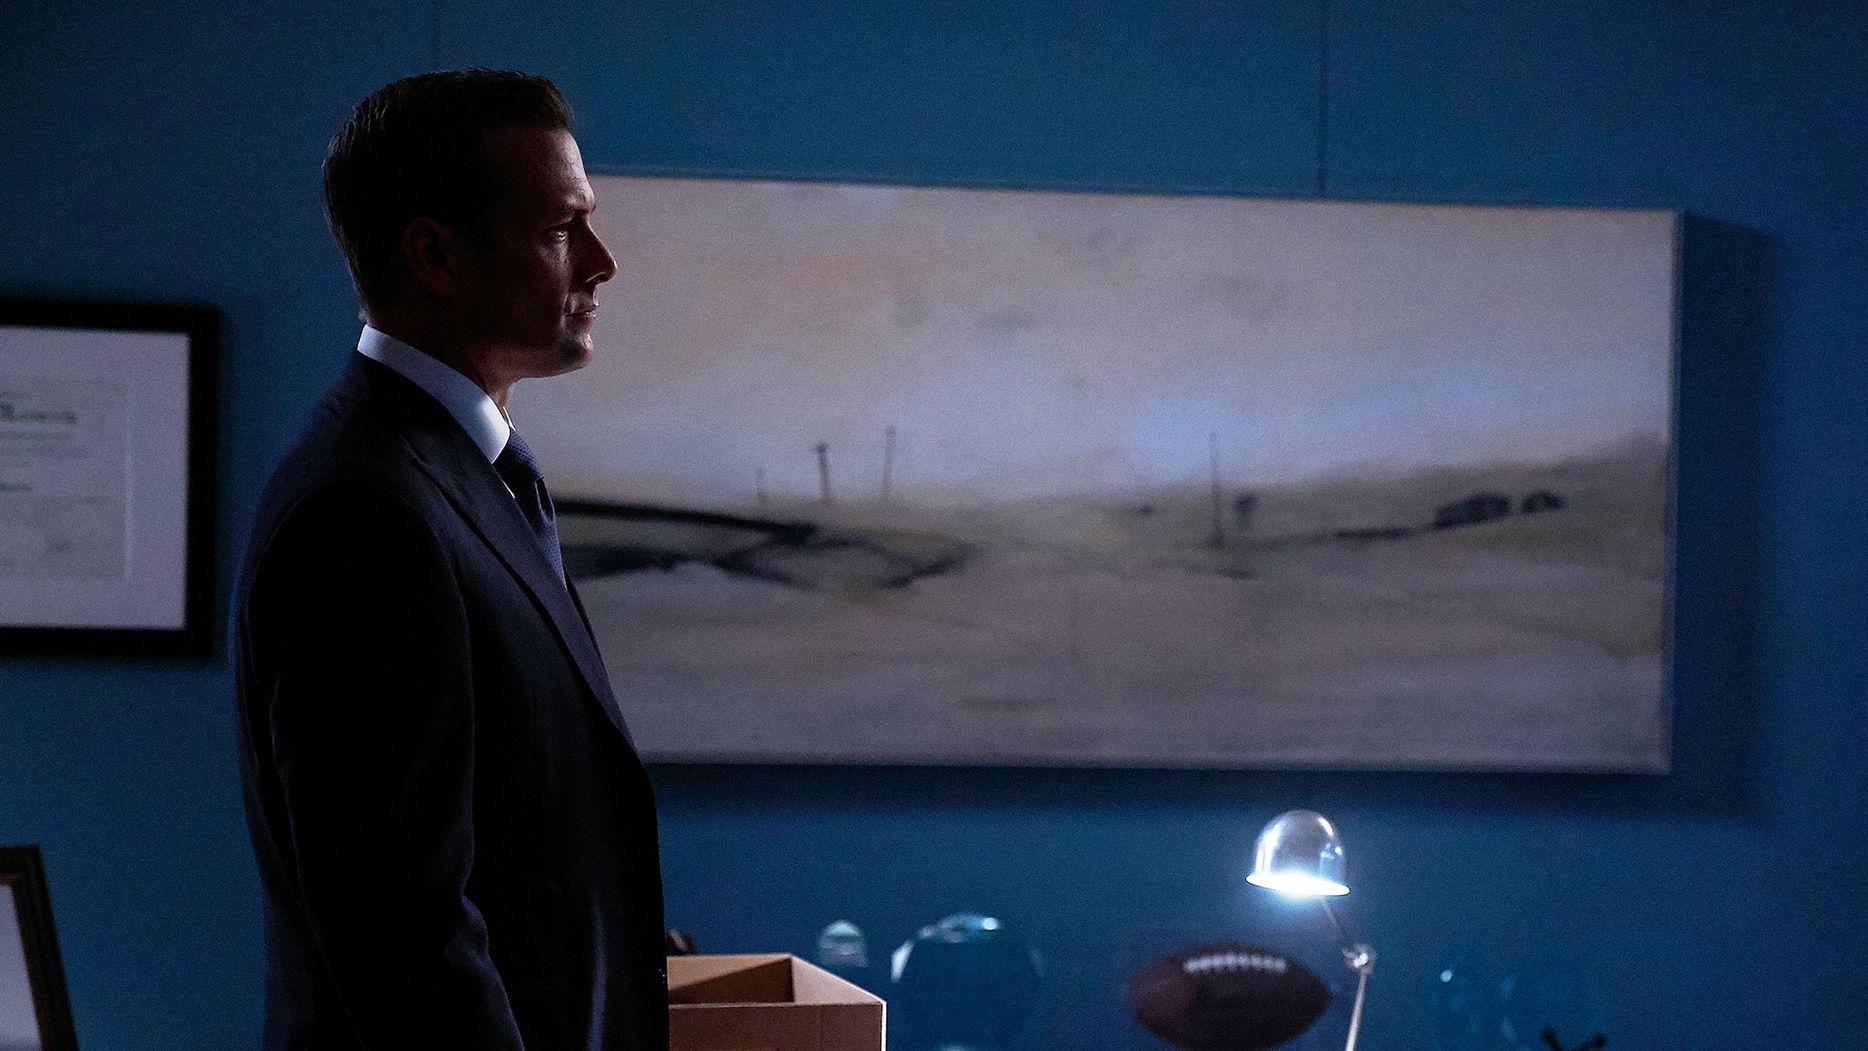 File:S07E07Promo01 - Harvey.jpg